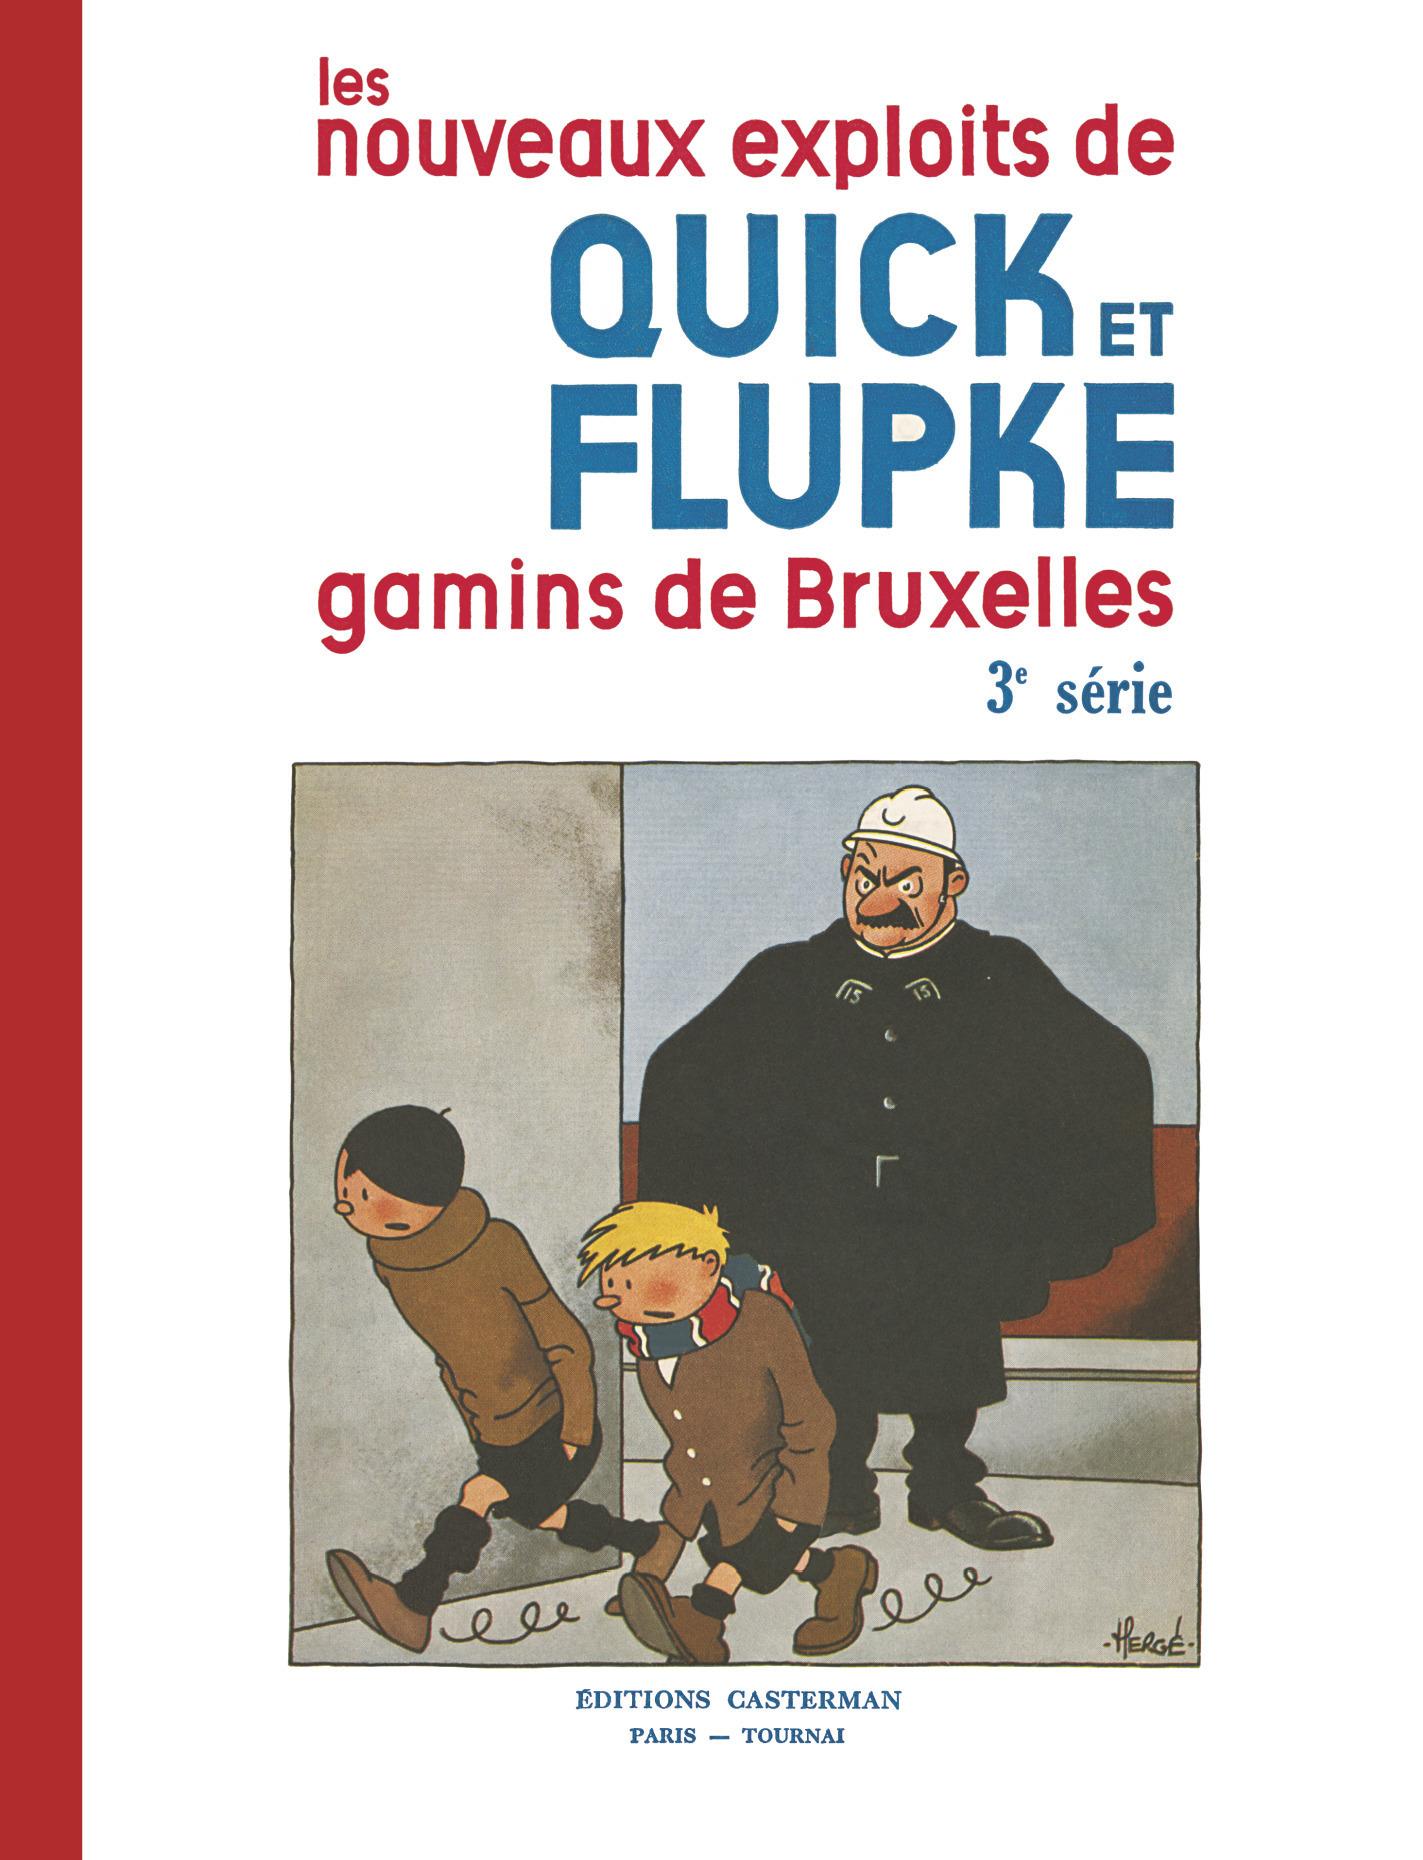 FAC-SIMILES N&B - T03 - GAMINS DE BRUXELLES